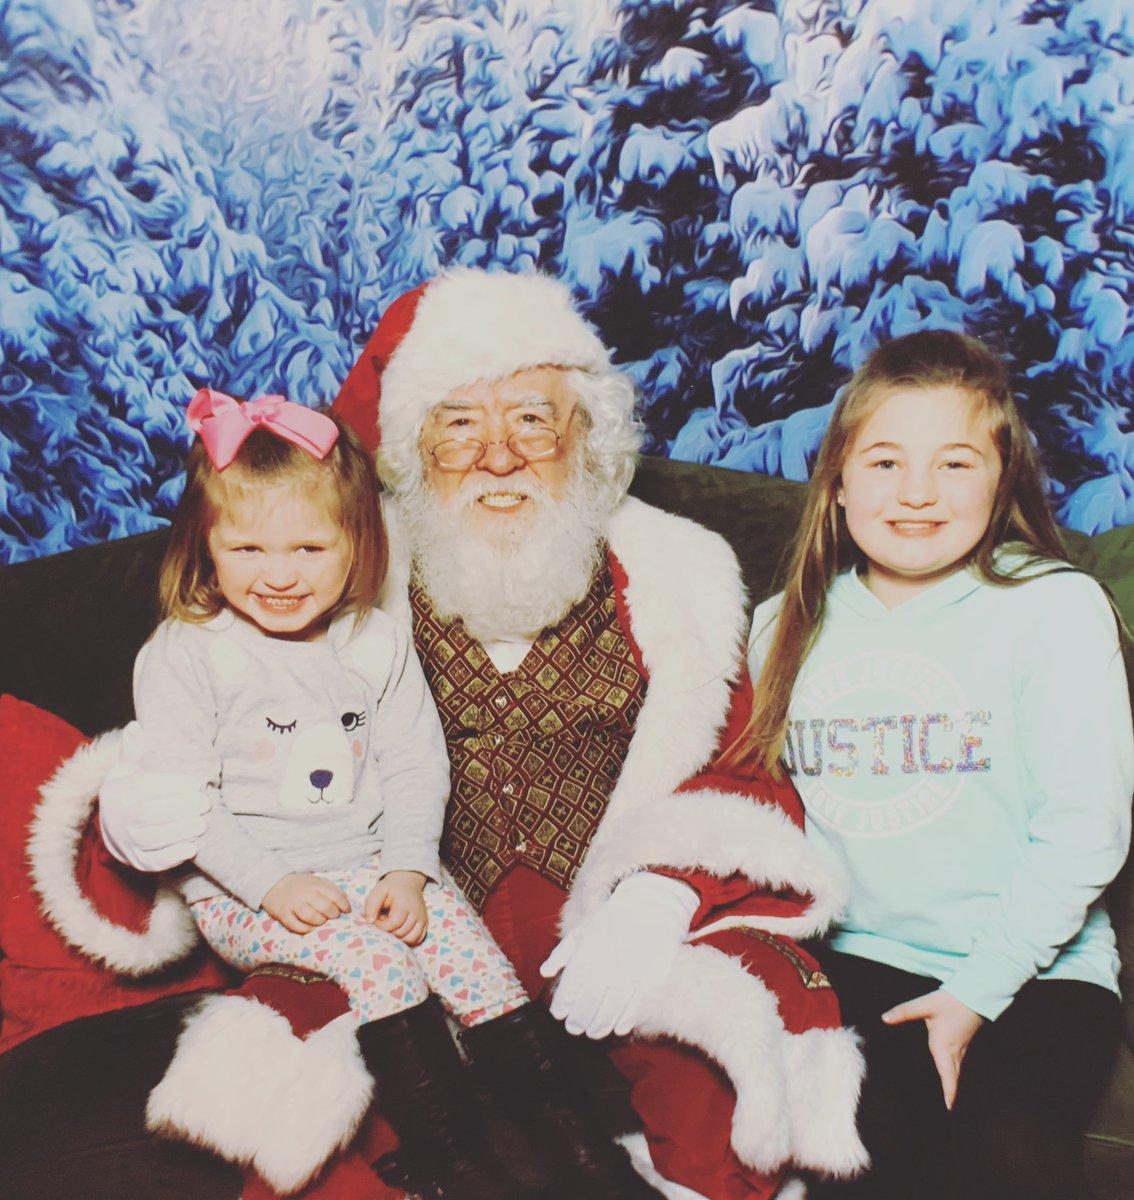 RT @krissyK01: Visit with Santa! @ItsGaryTime @AmberLPortwood #Christmas2018 https://t.co/8dHt0mYJyl